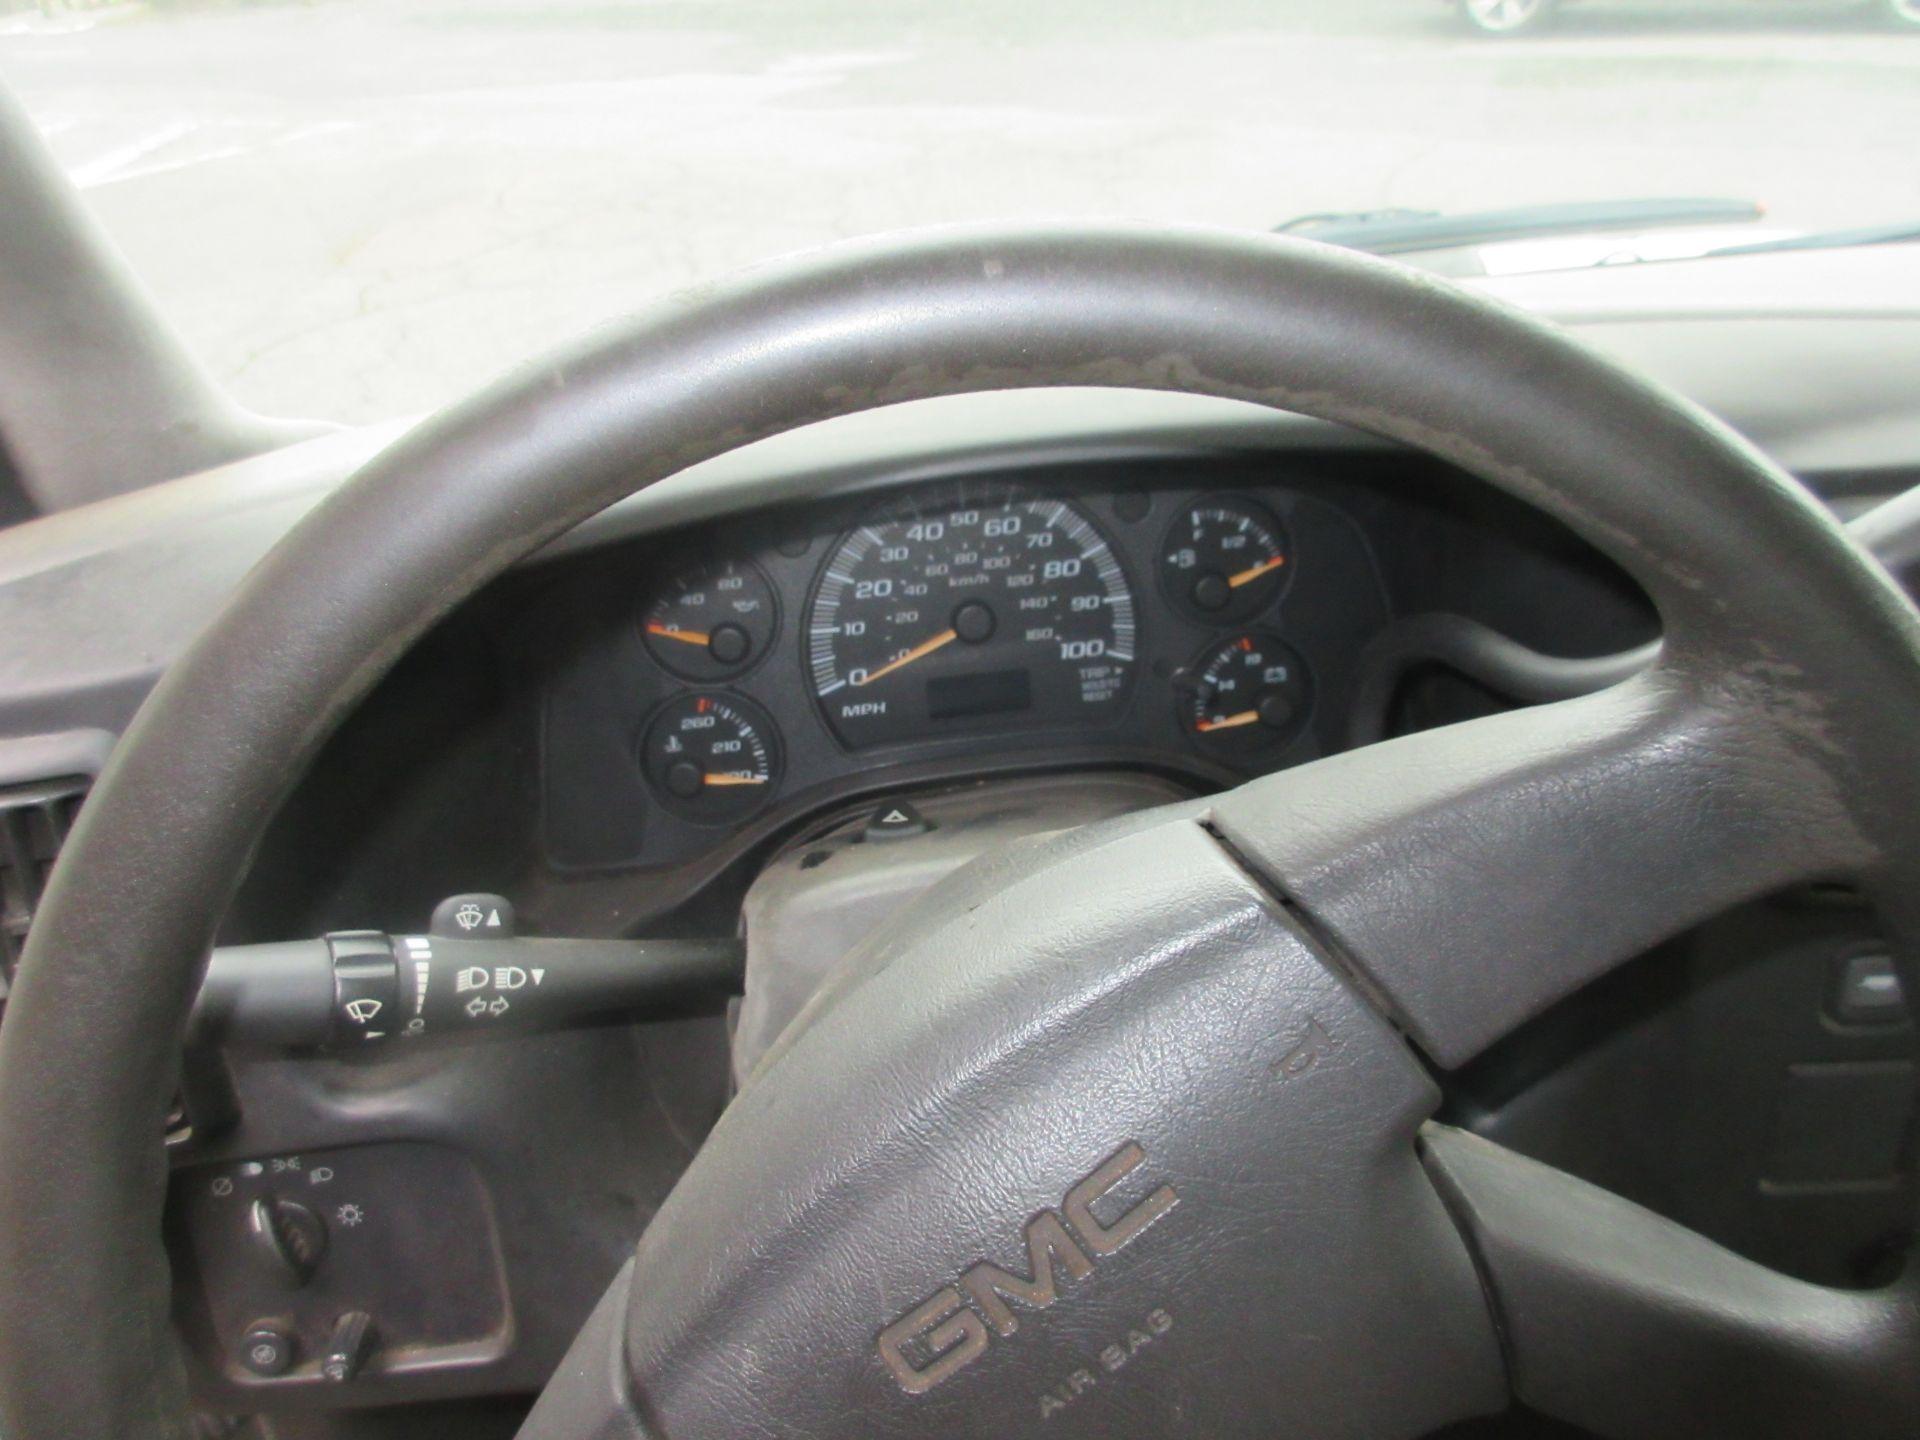 Bulk Bid Includes (1) Line Boring Truck Including 2004 GMC Savana 3500 Box Truck 2WD 8 Cylinders U - Image 5 of 27